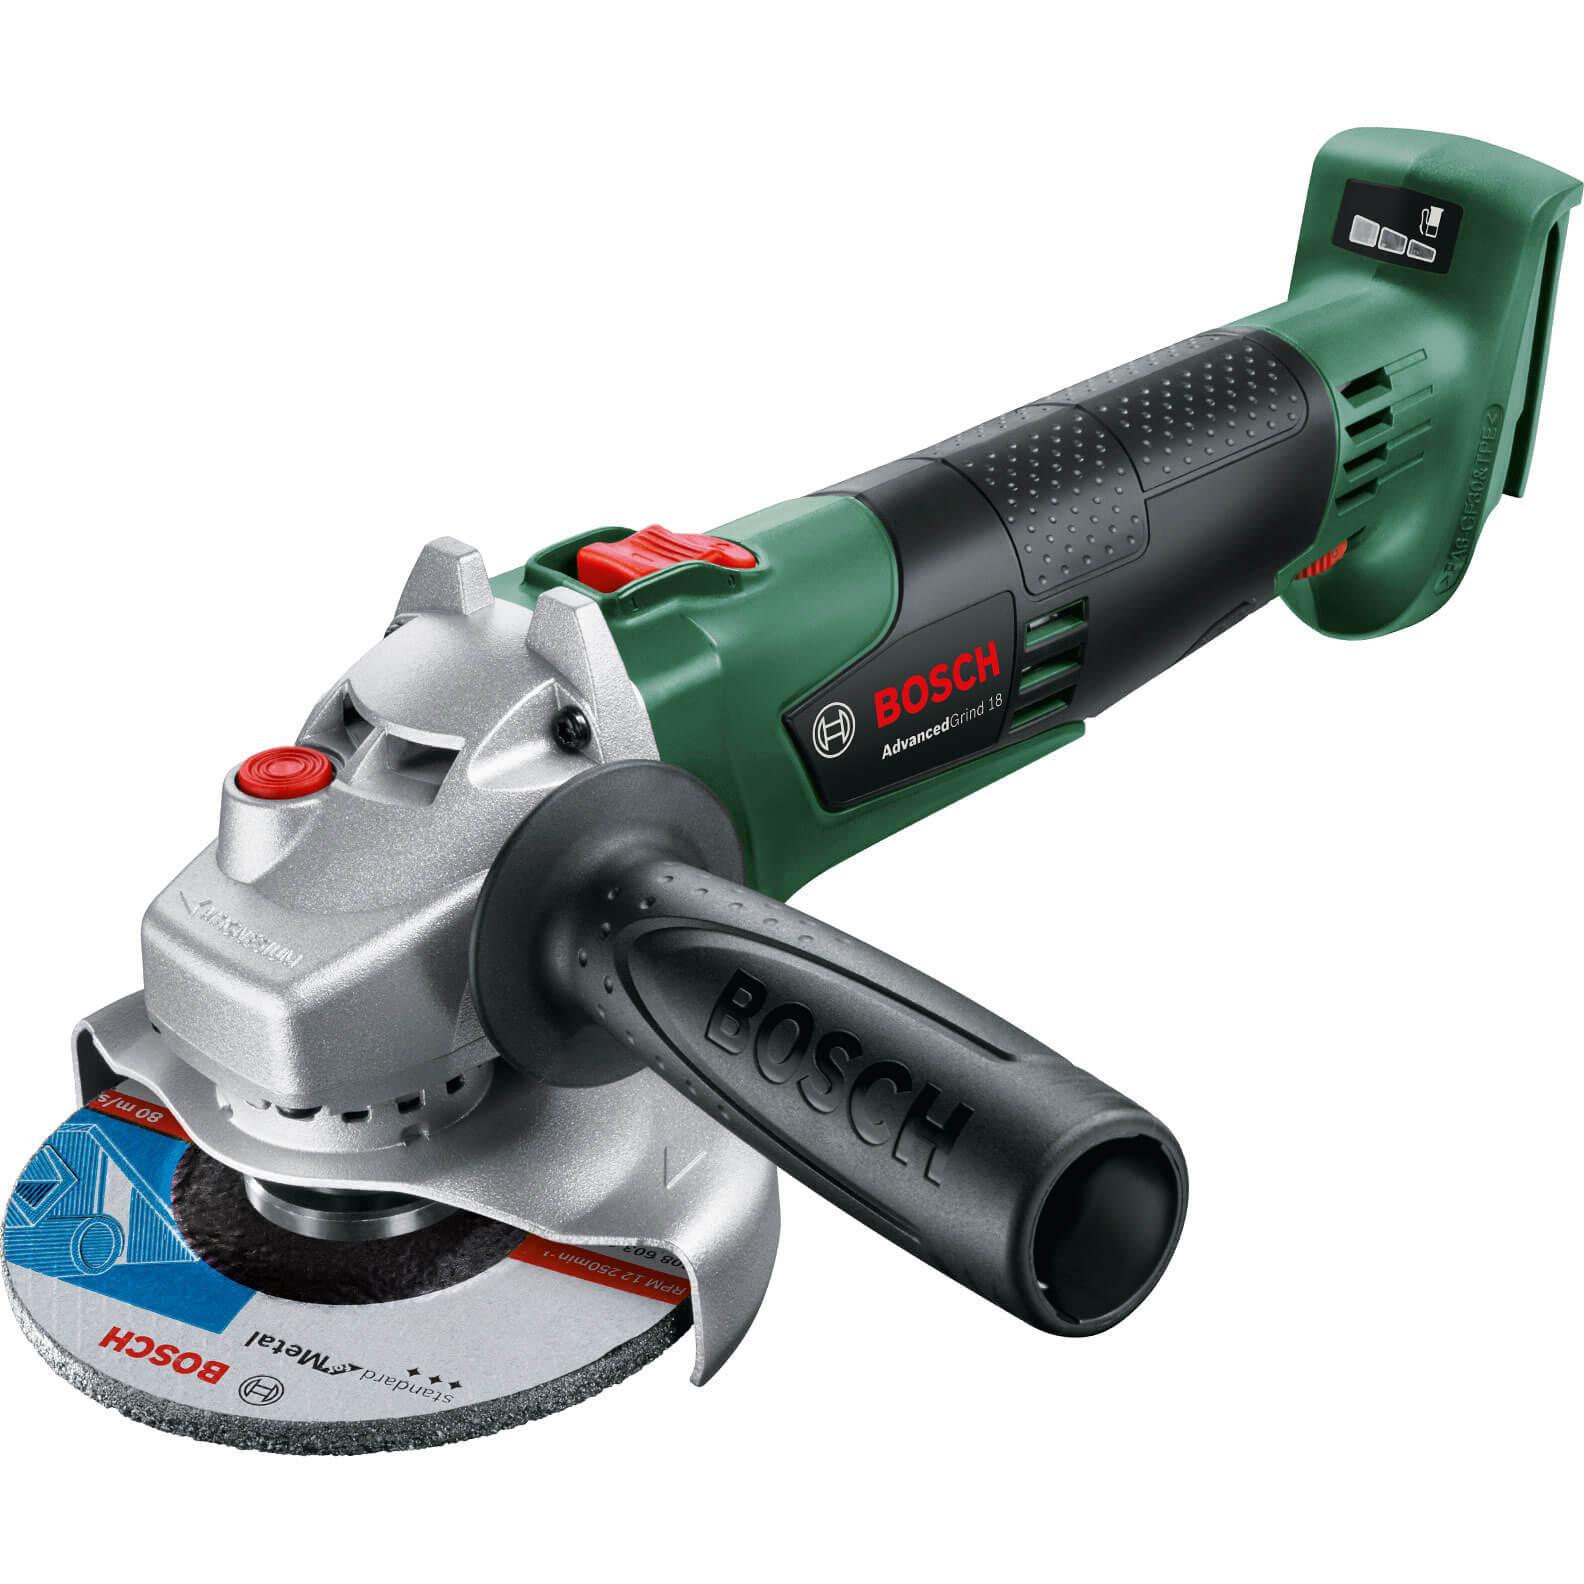 Image of Bosch ADVANCEDGRIND 18v Cordless Angle Grinder 125mm No Batteries No Charger No Case